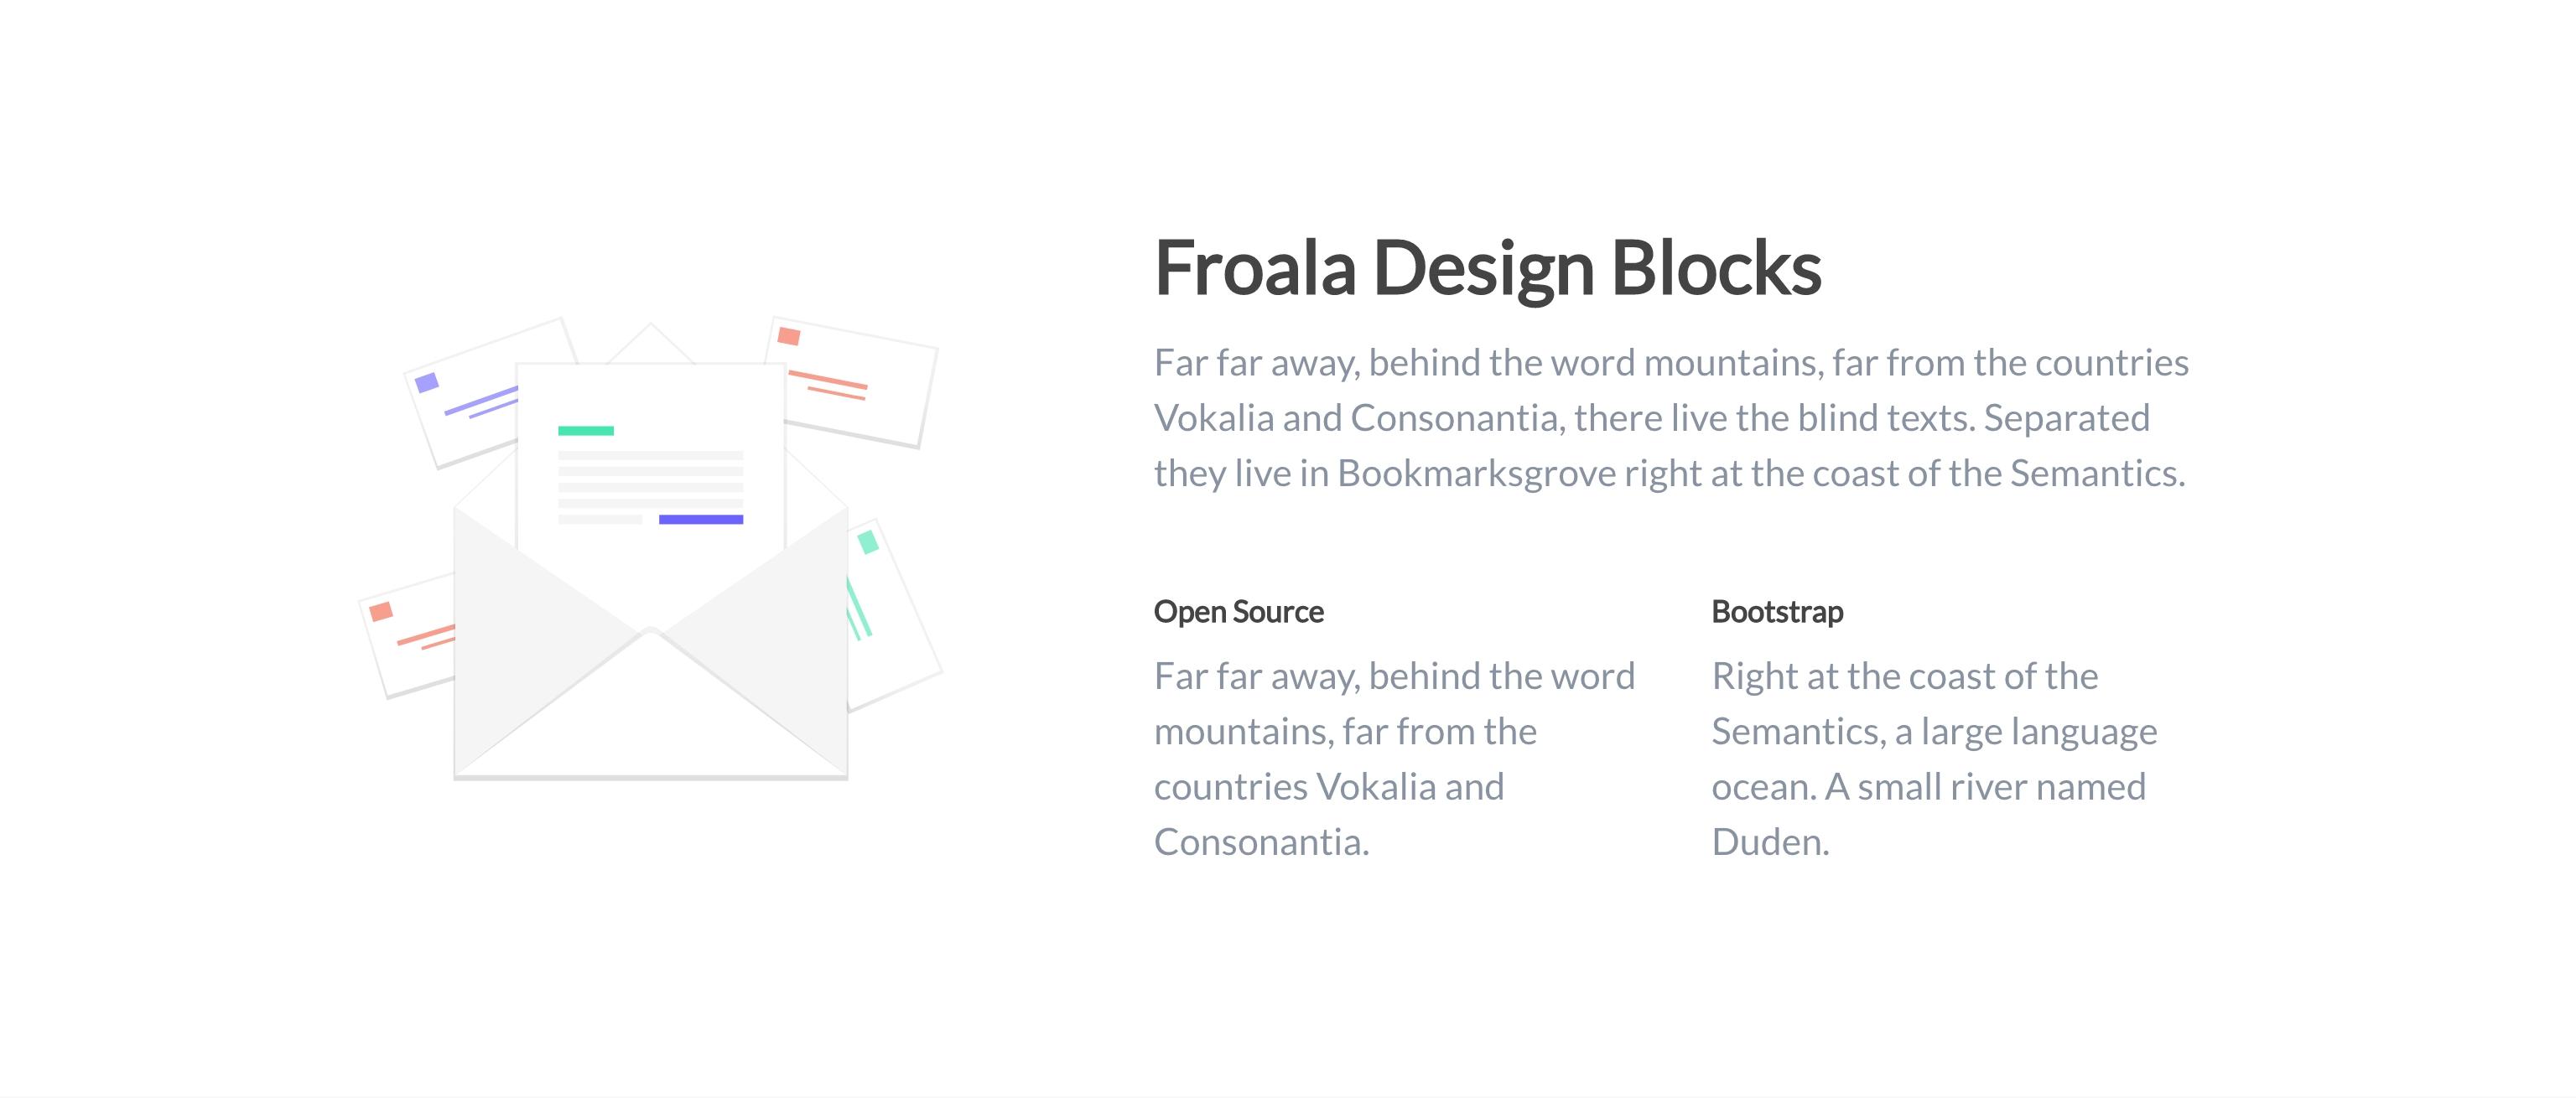 Design Blocks Froala Block Diagram Software View Examples And Templates Contents 35